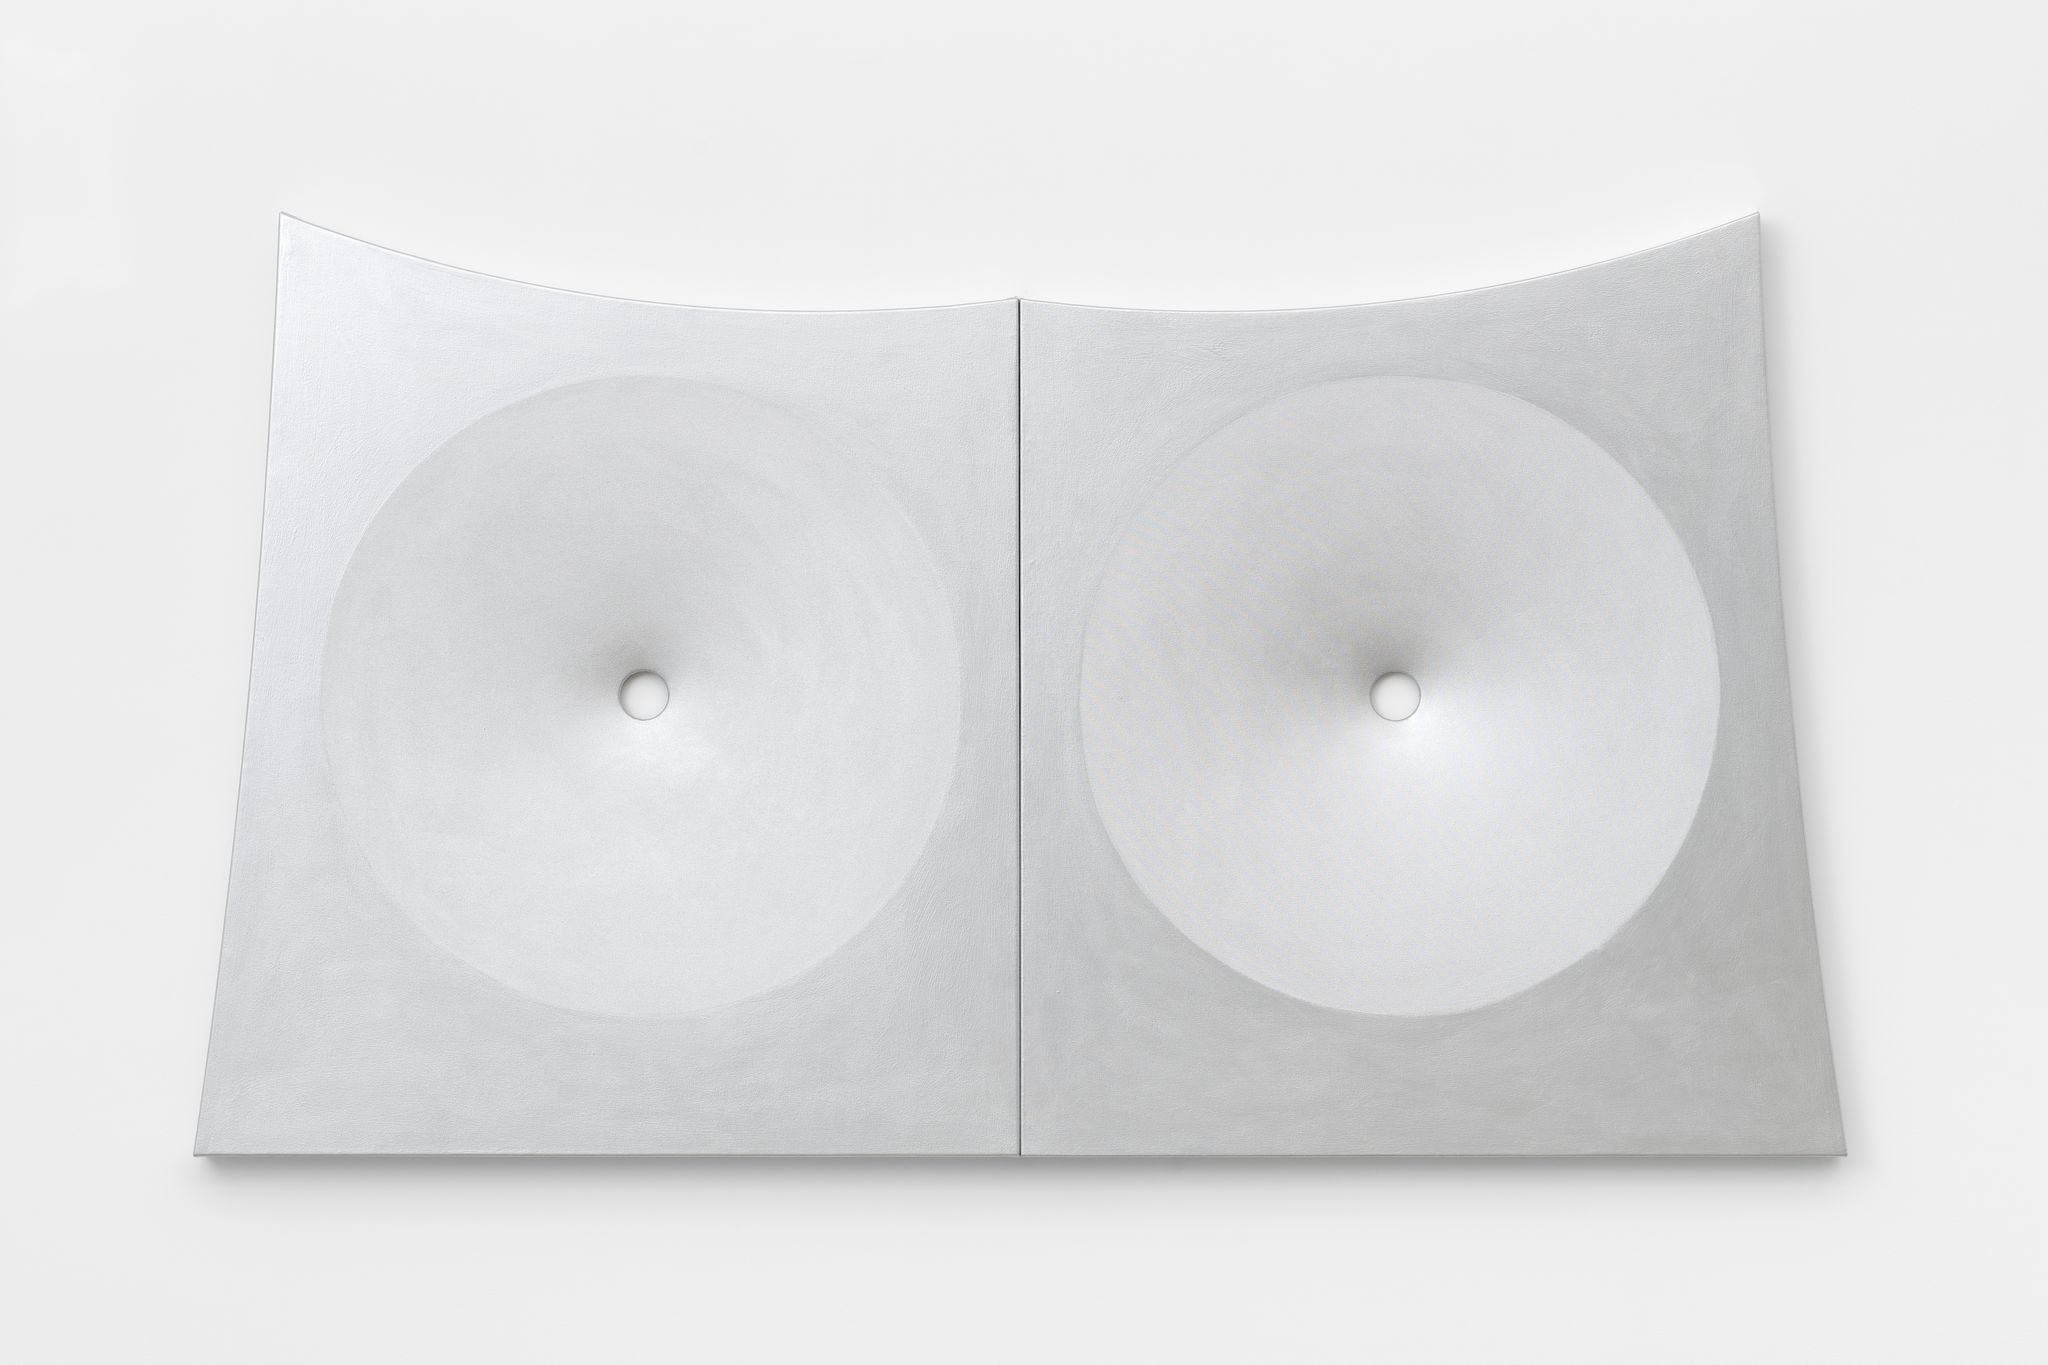 Blair Thurman, Alpine Stereo, 2019 Acrylic on canvas on wood, diptych 137 x 217 x 6 cm 54 x 94 1/8 x 2 3/8 in